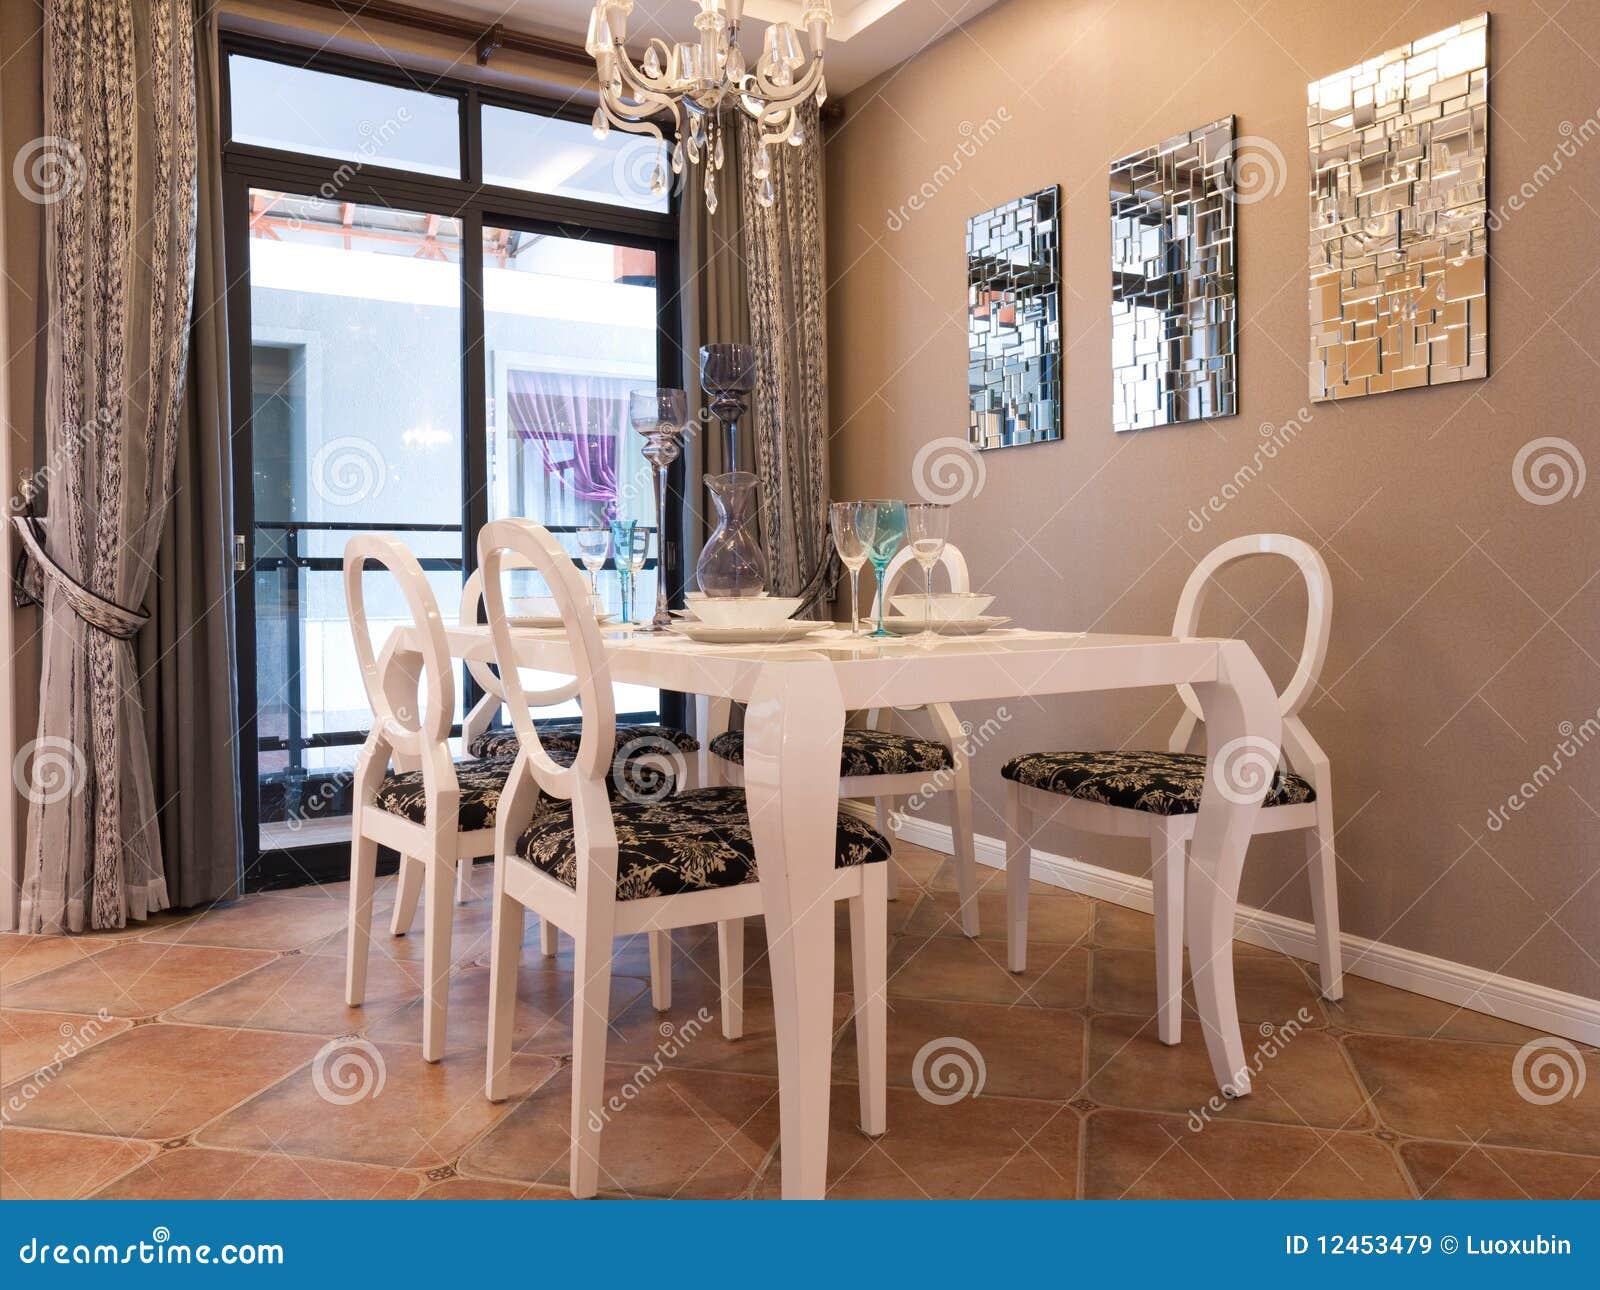 Moderne eetkamer stock afbeelding afbeelding bestaande uit decoratie 12453479 - Moderne eetkamerstoel eetkamer ...